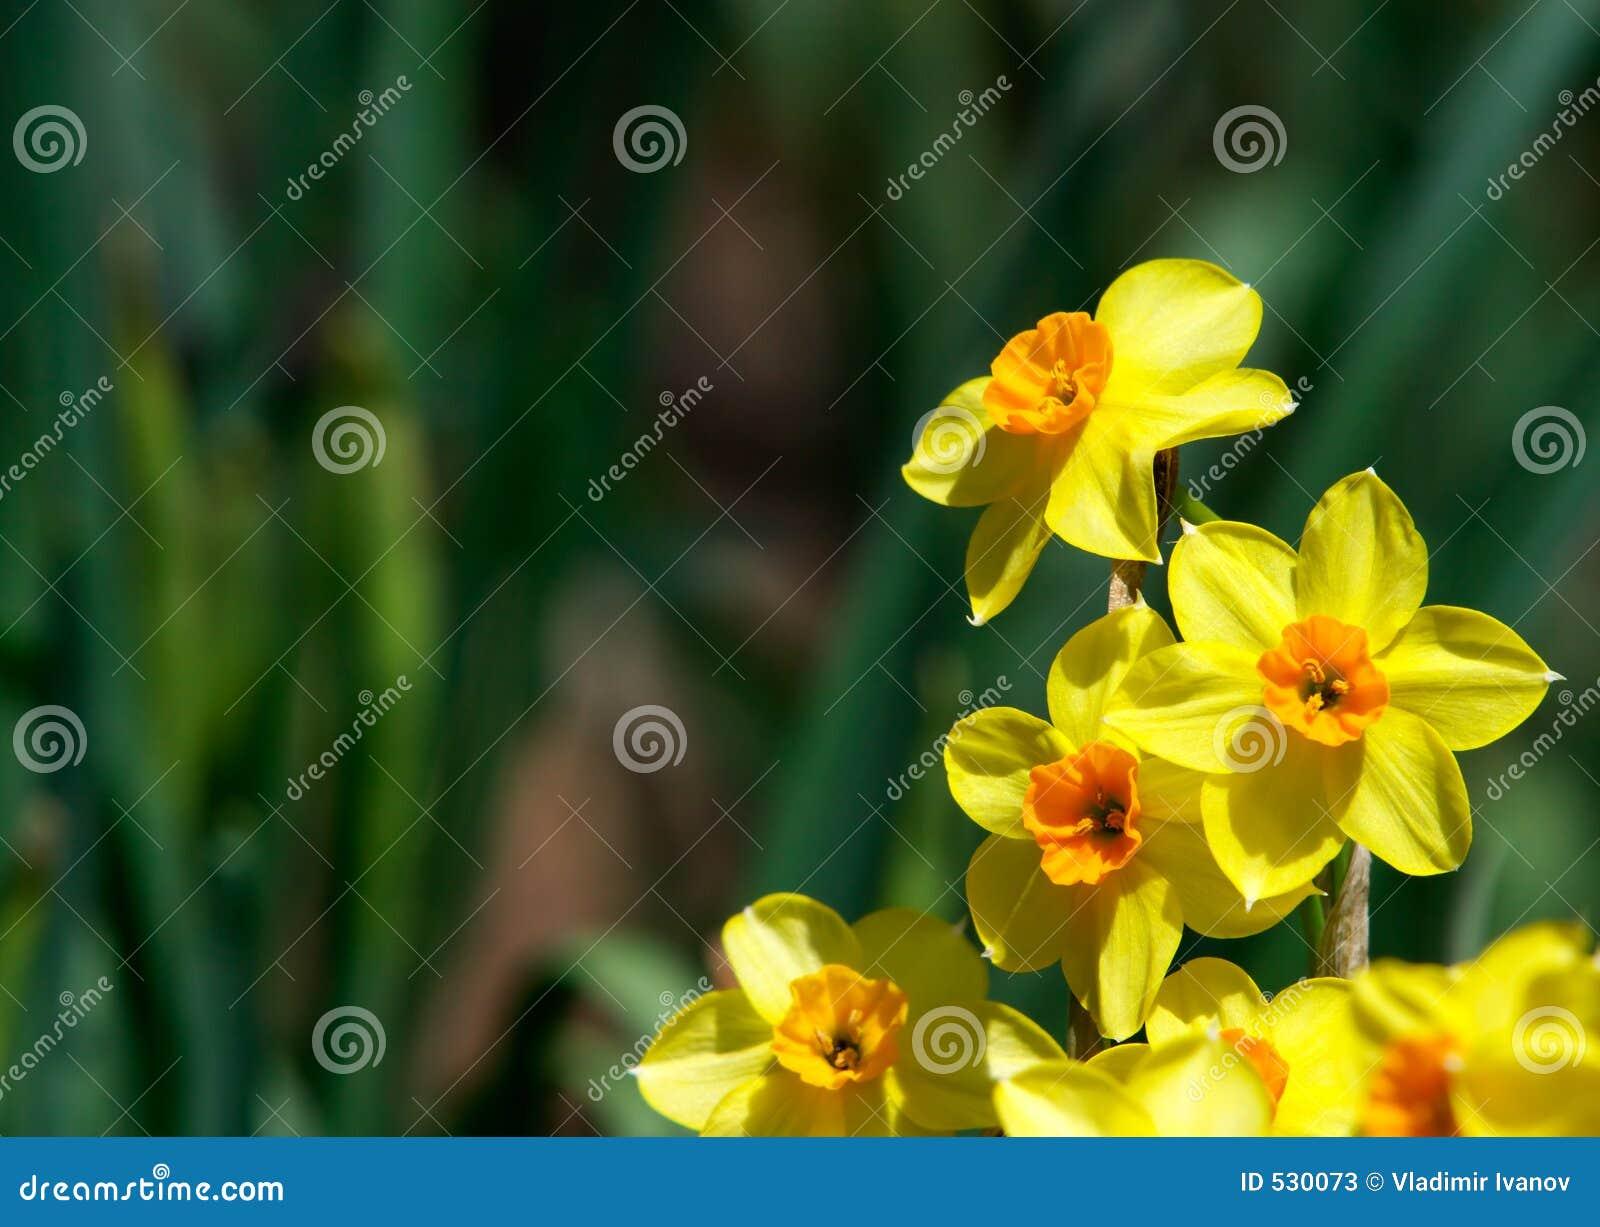 Download 黄水仙 库存图片. 图片 包括有 开花的, 黄色, 卖花人, 温暖, 过敏, 复活节, 水仙, 绽放, 庭院 - 530073